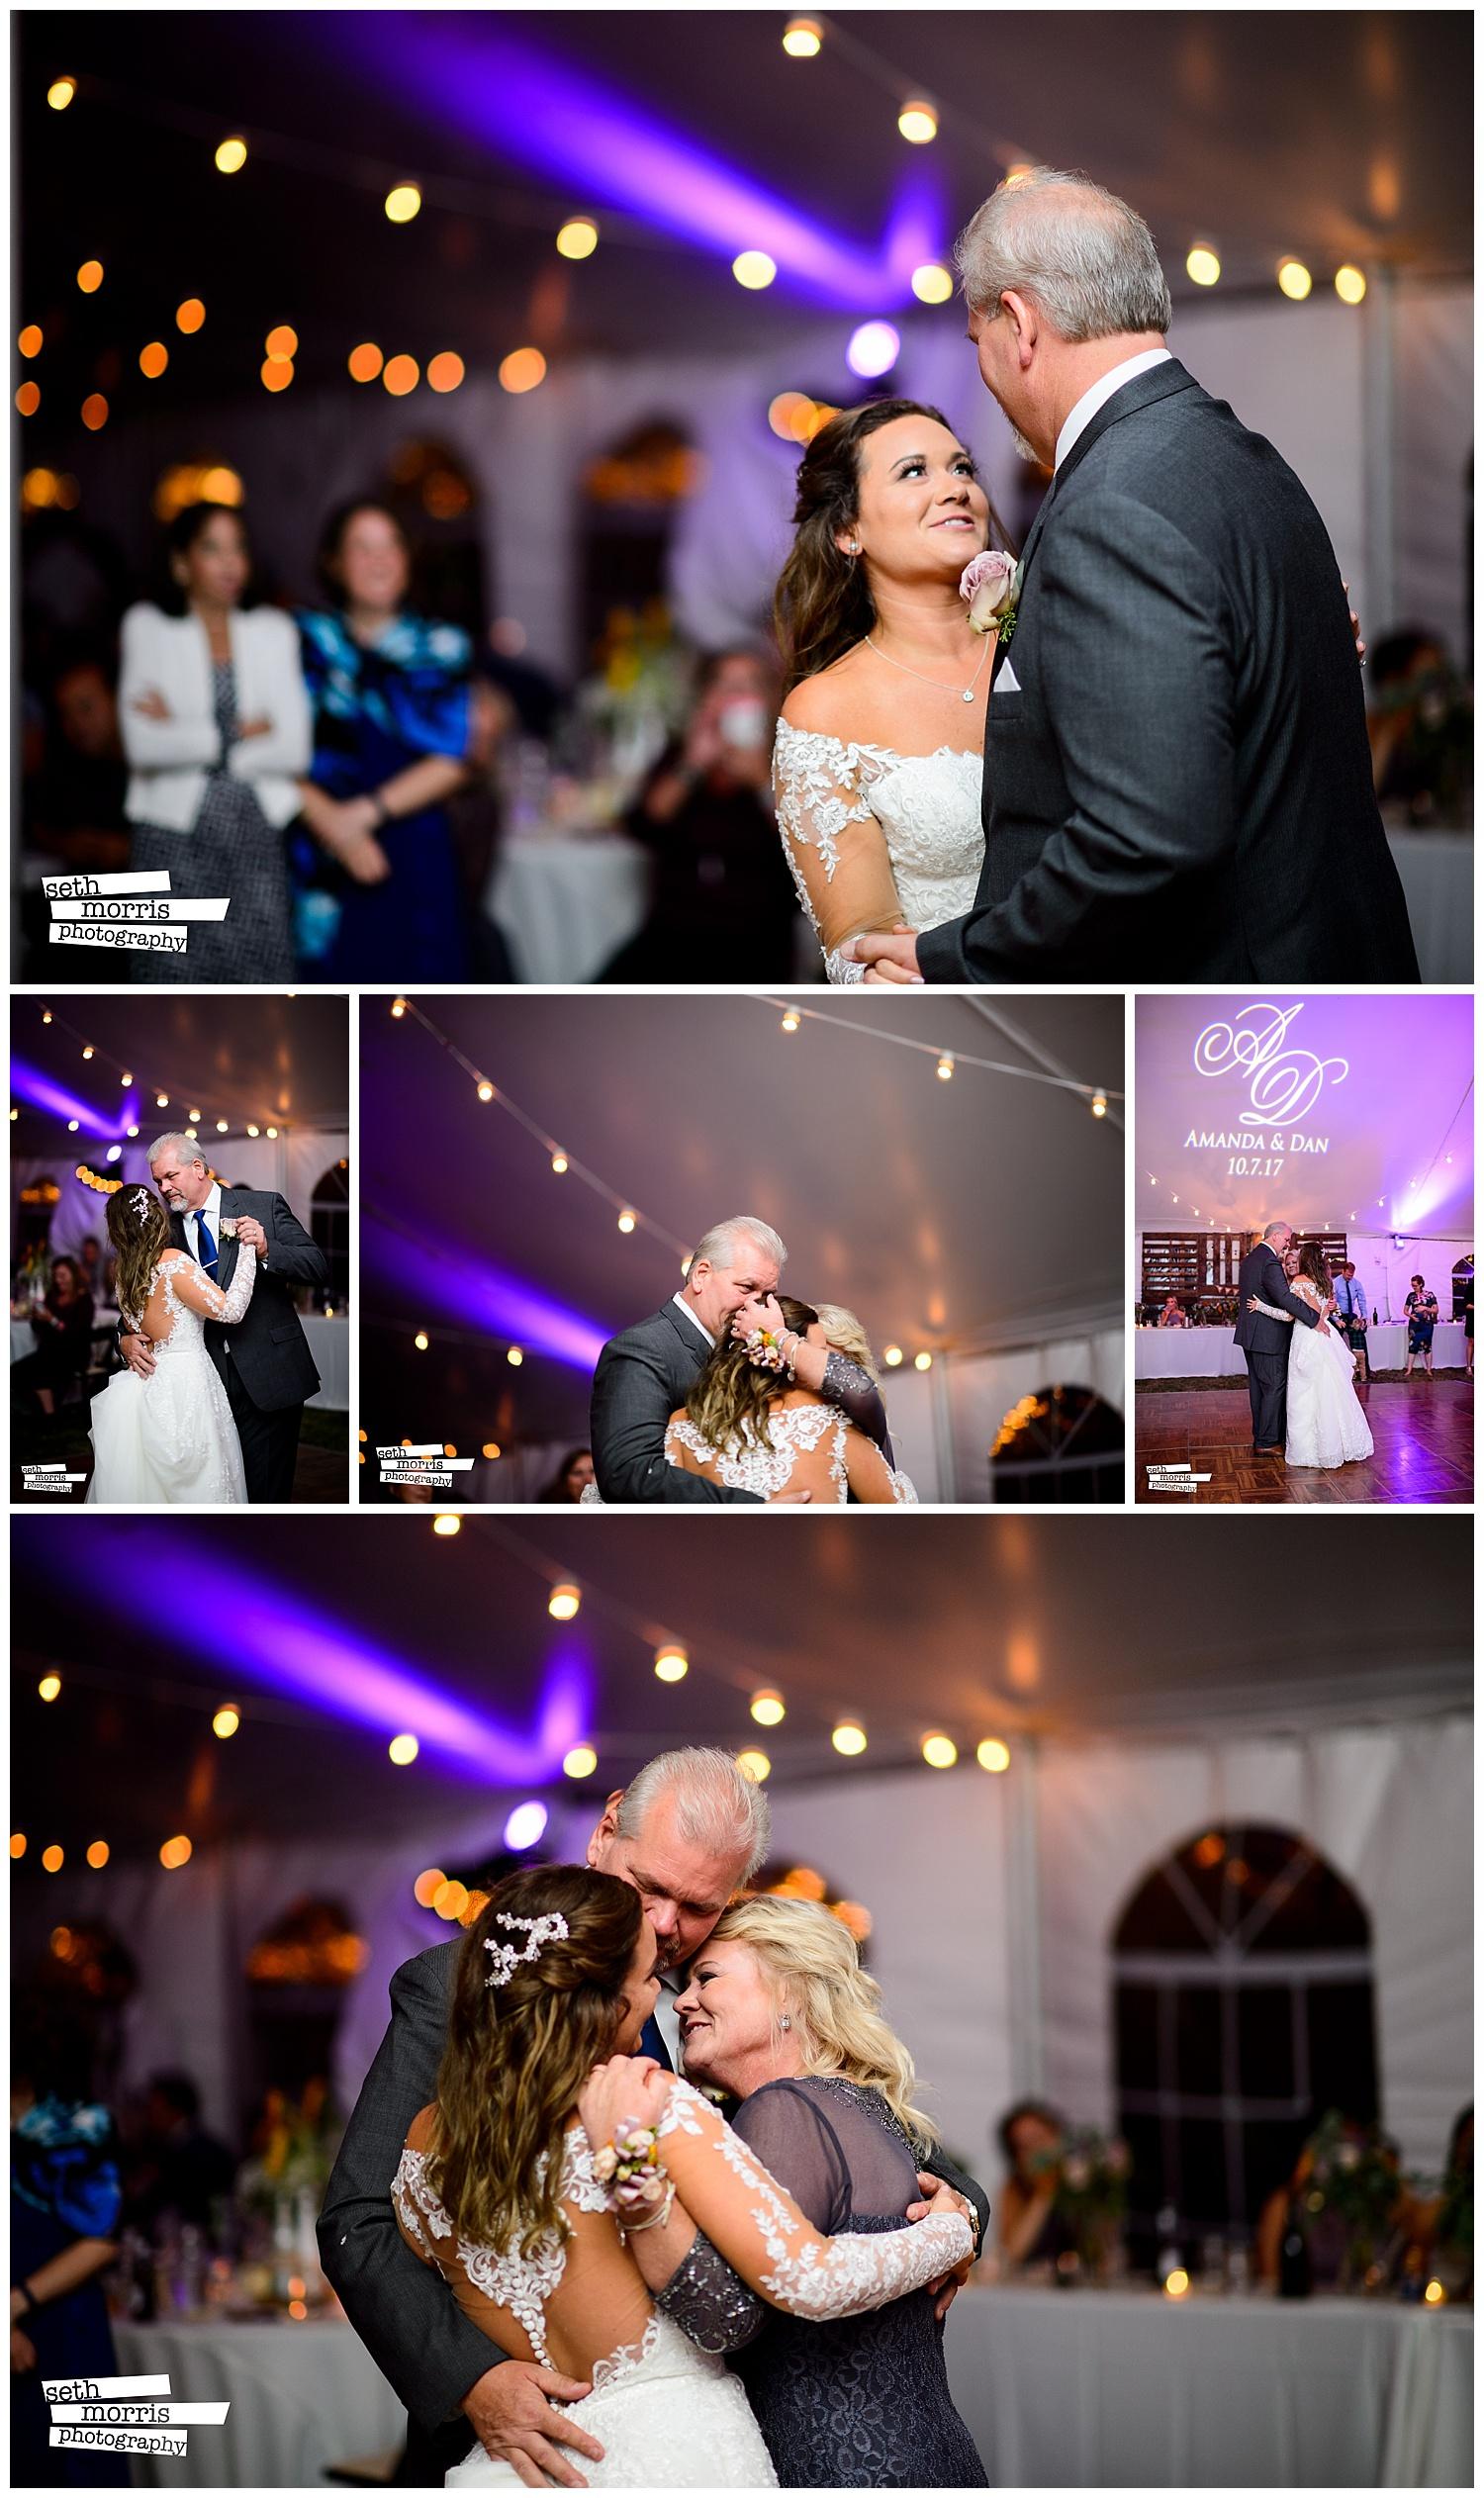 ottawa-tent-wedding-reception-rainy wedding-pictures-77.jpg